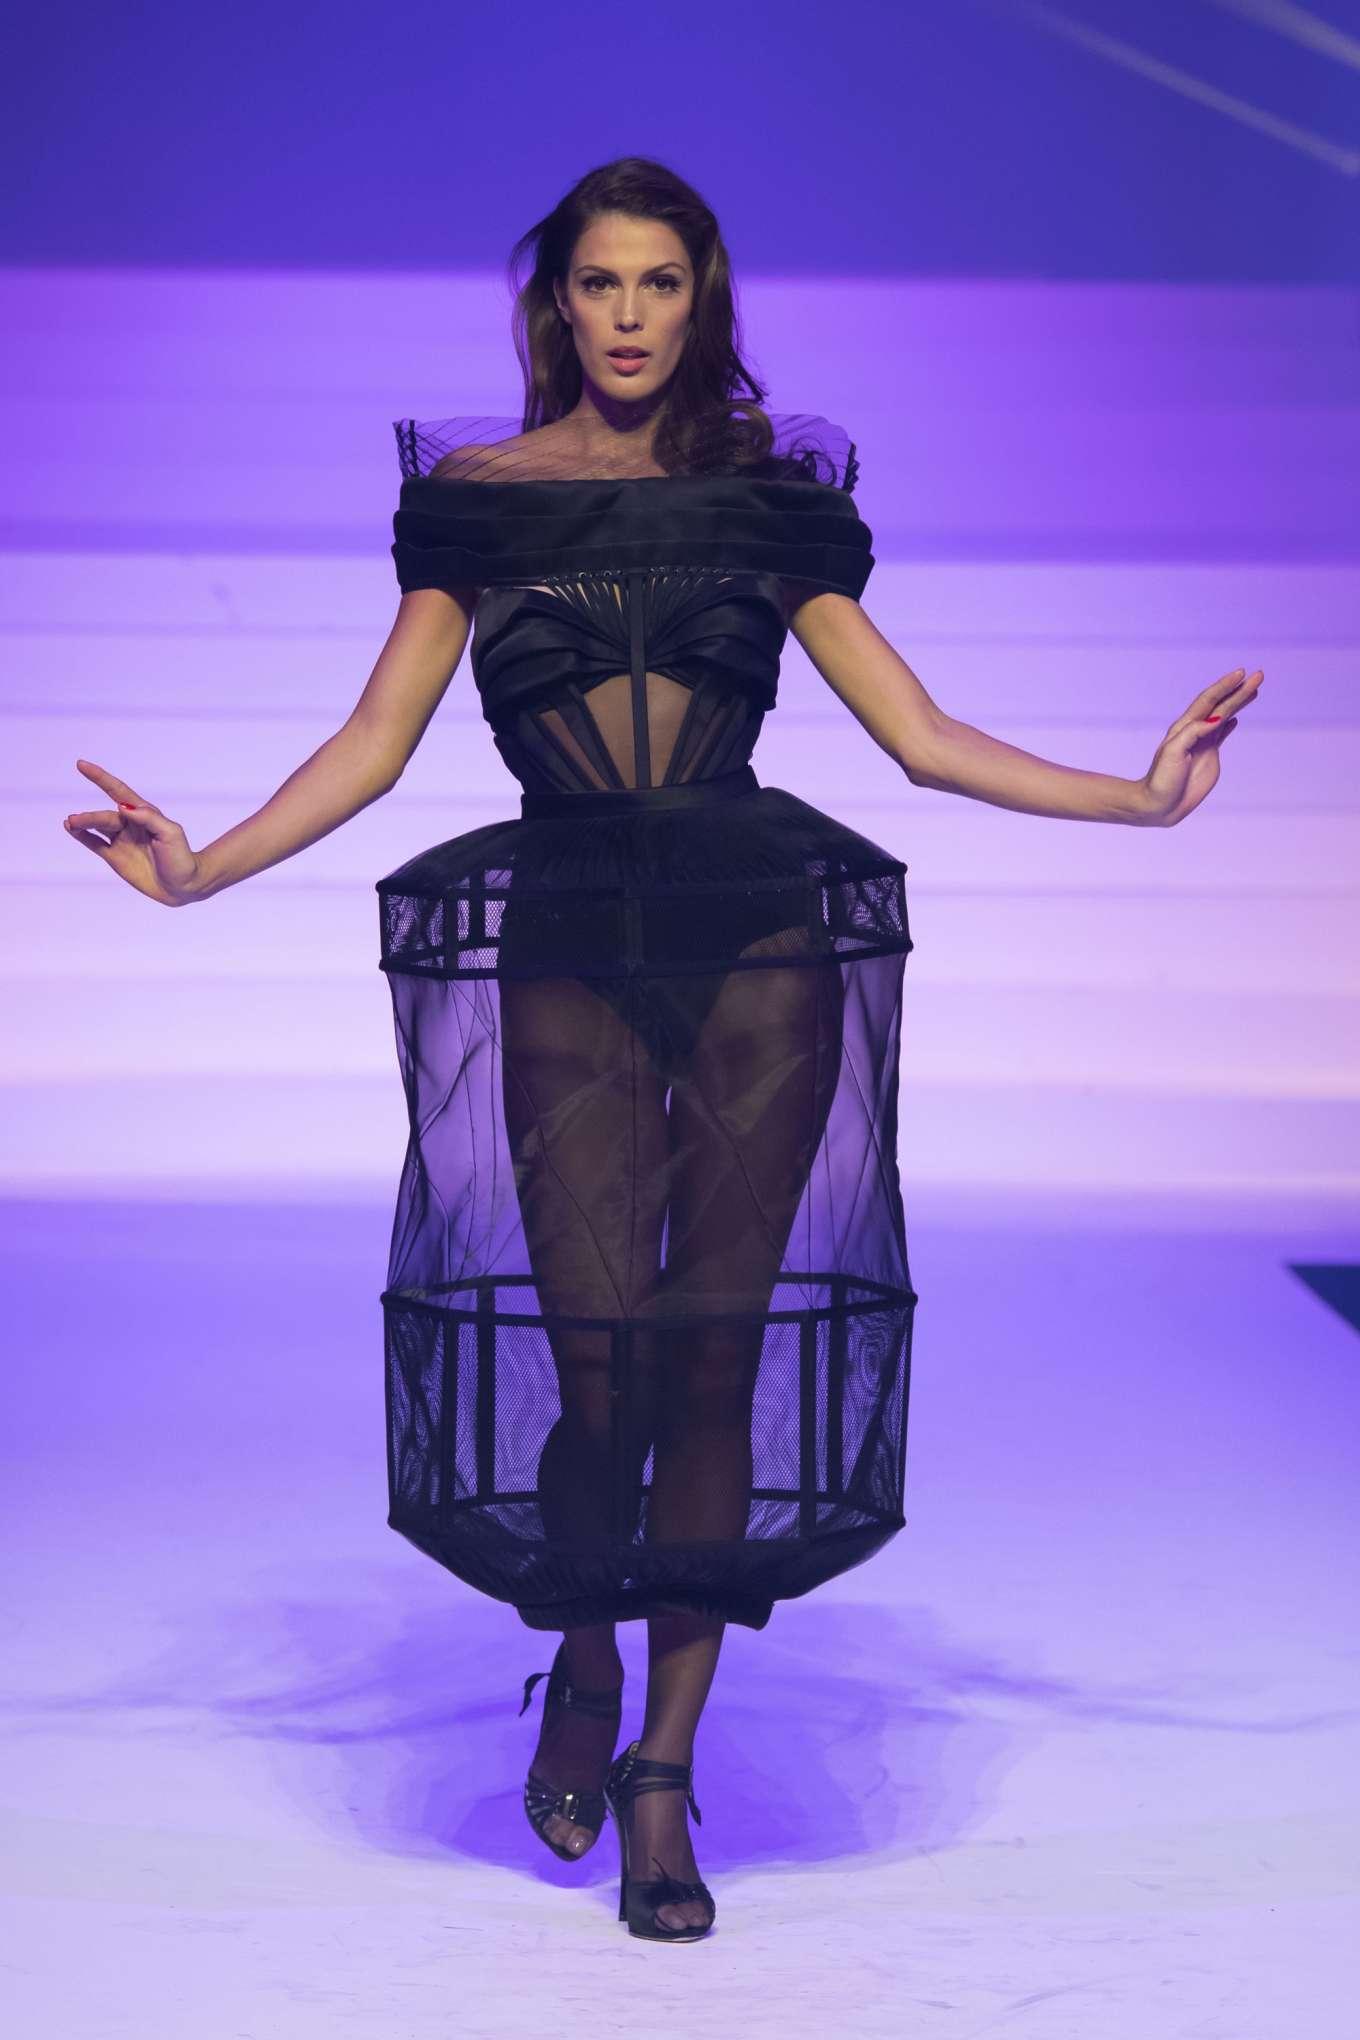 Iris Mittenaere 2020 : Iris Mittenaere – Jean-Paul Gaultier Runway Show in Paris-12